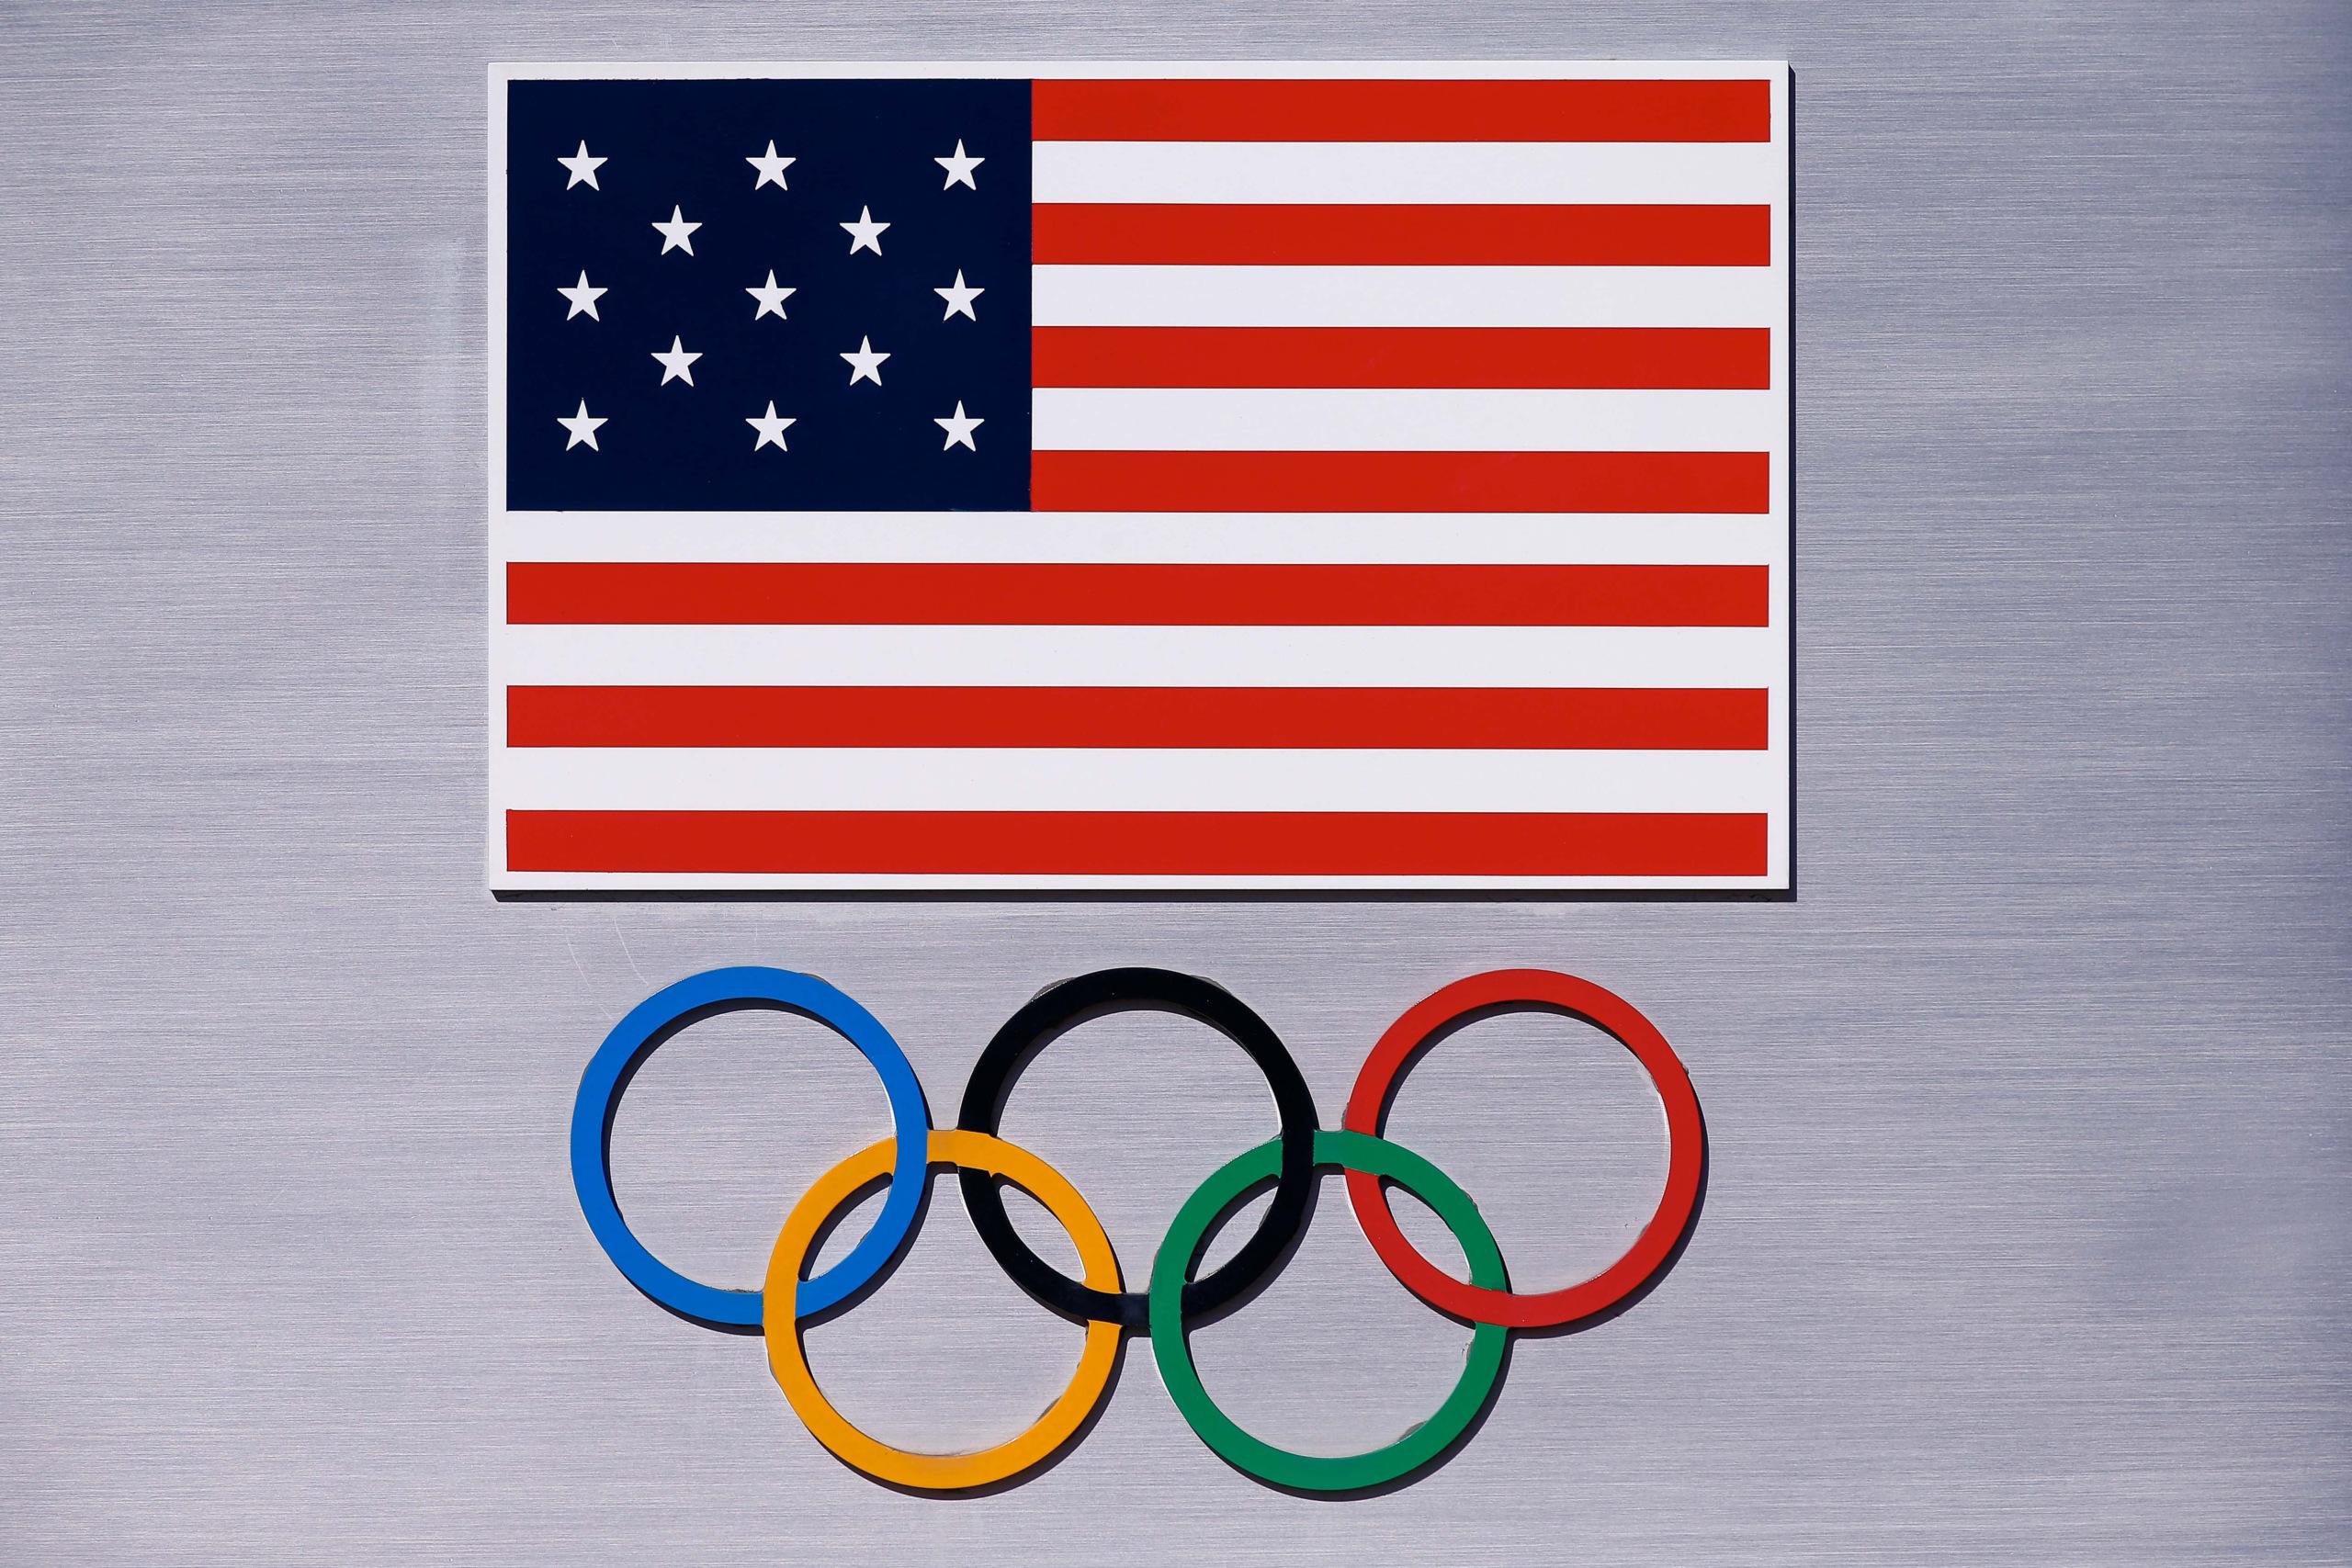 Olympics: U.S. Olympic Training Center